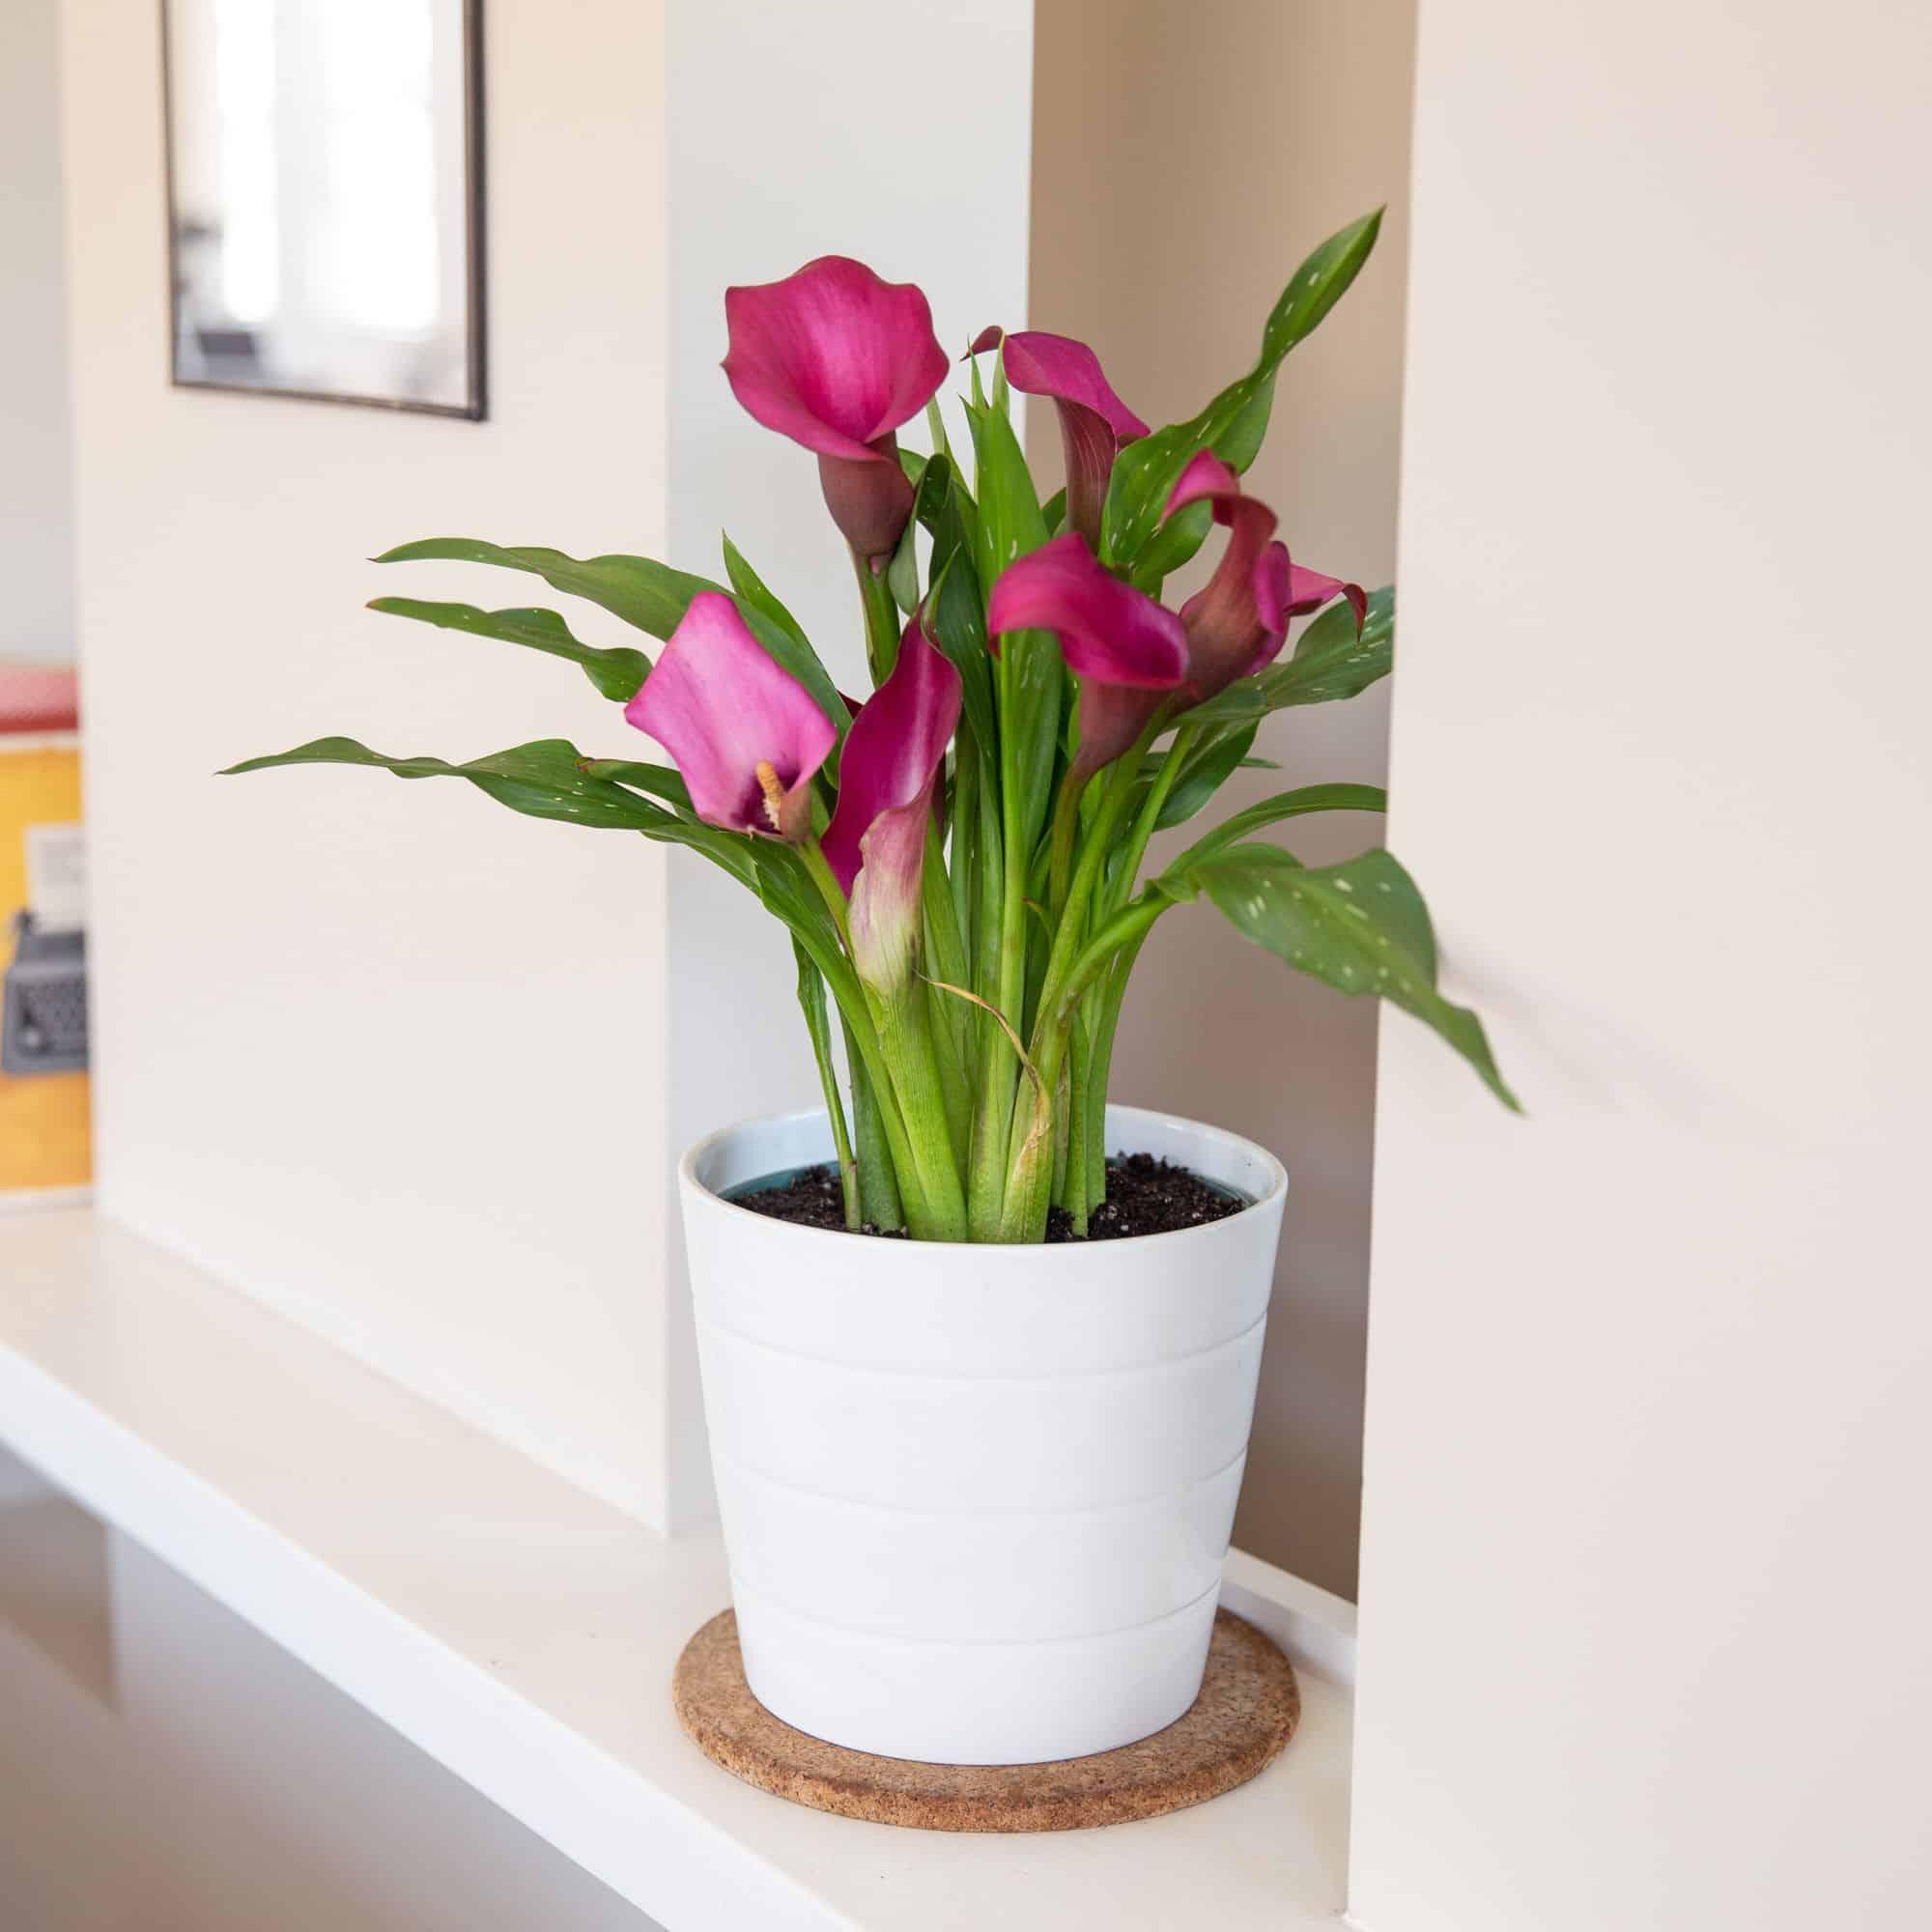 grow-calla-lily-indoors